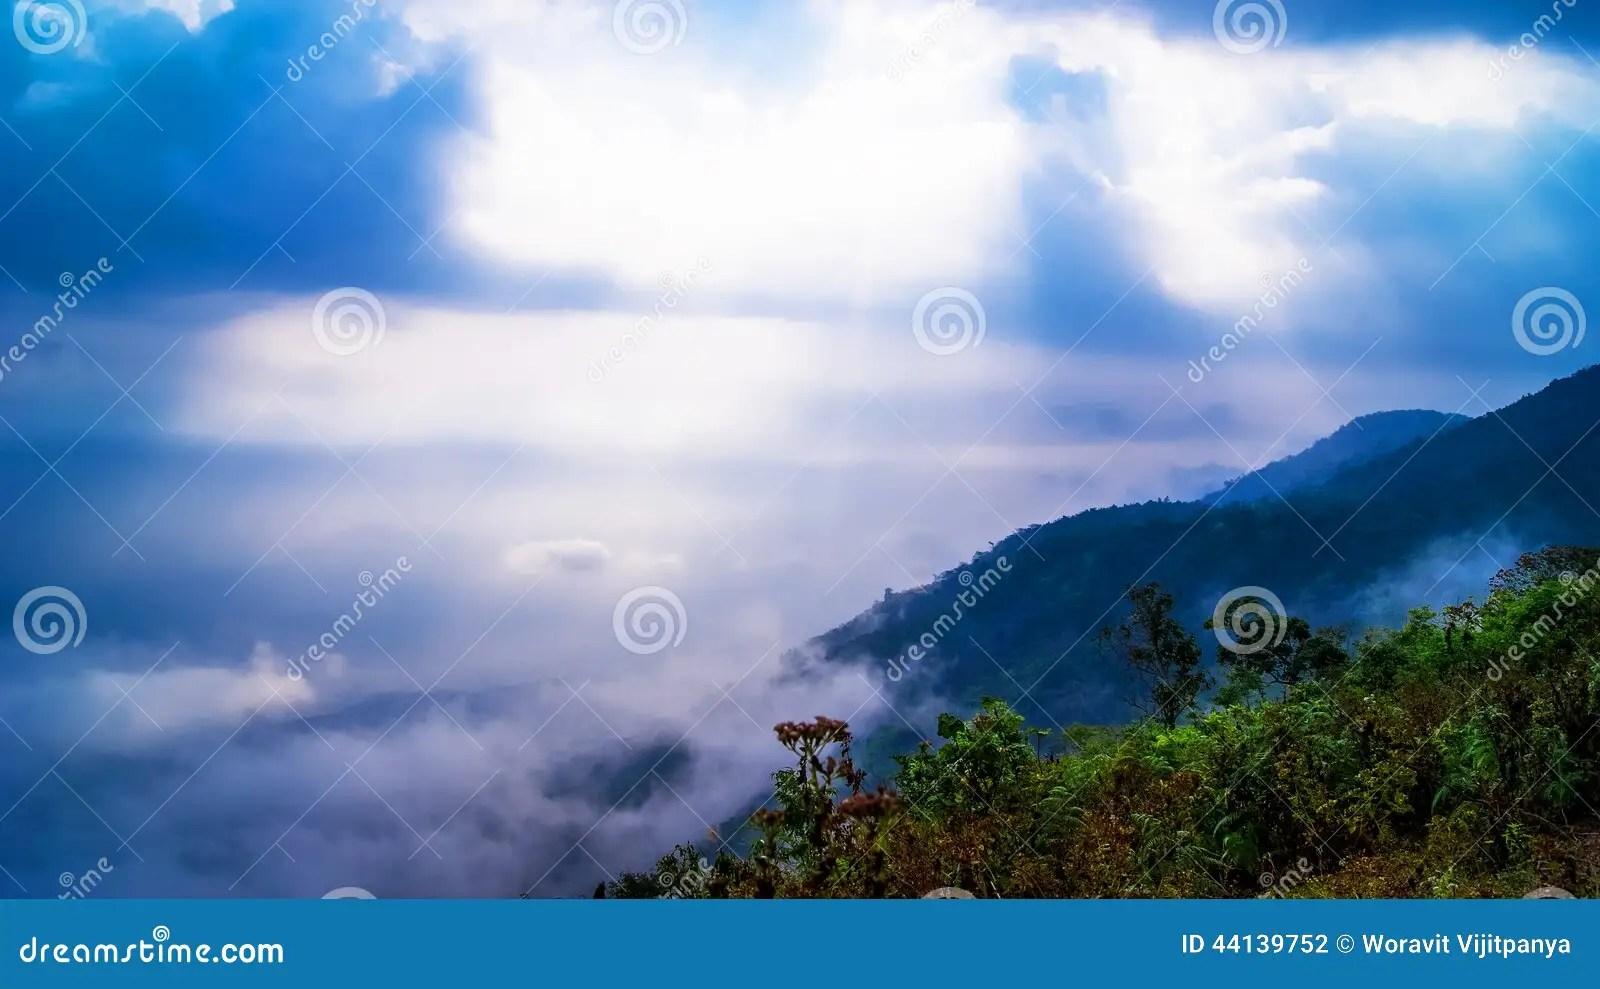 Sun Rays Mountain Landscape Stock Photo Image 44139752